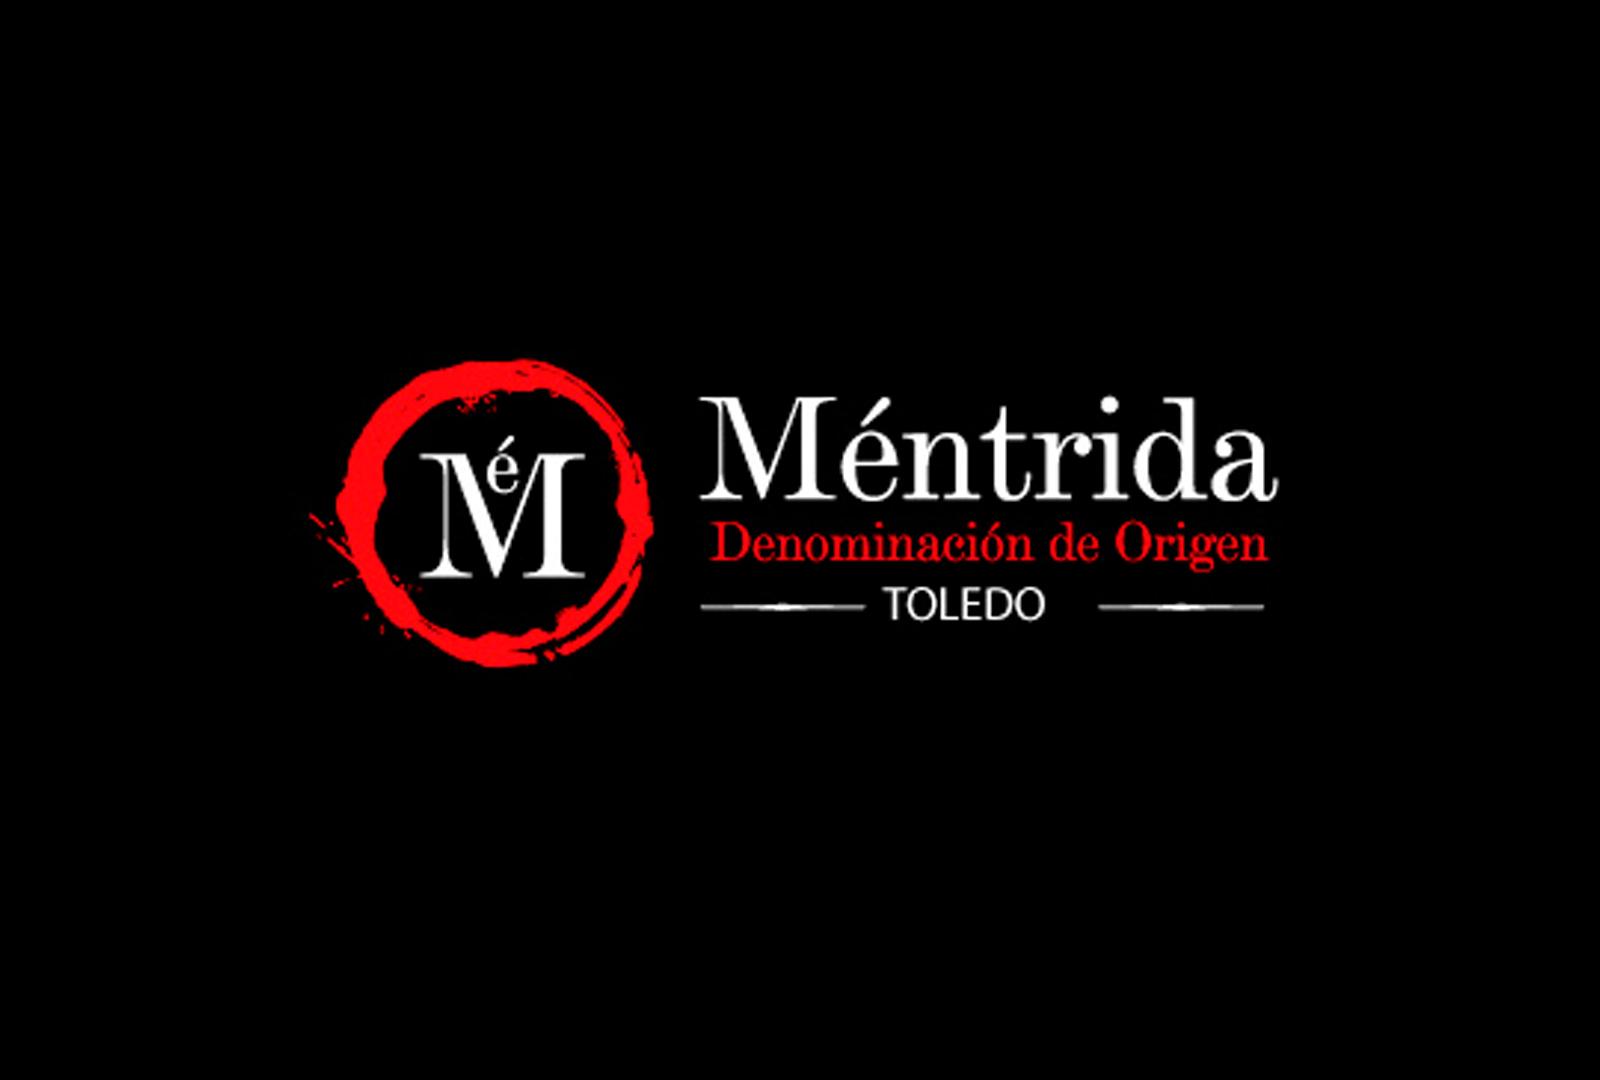 13 bodegas de la DO Méntrida participan en la Fiesta de la Vendimia